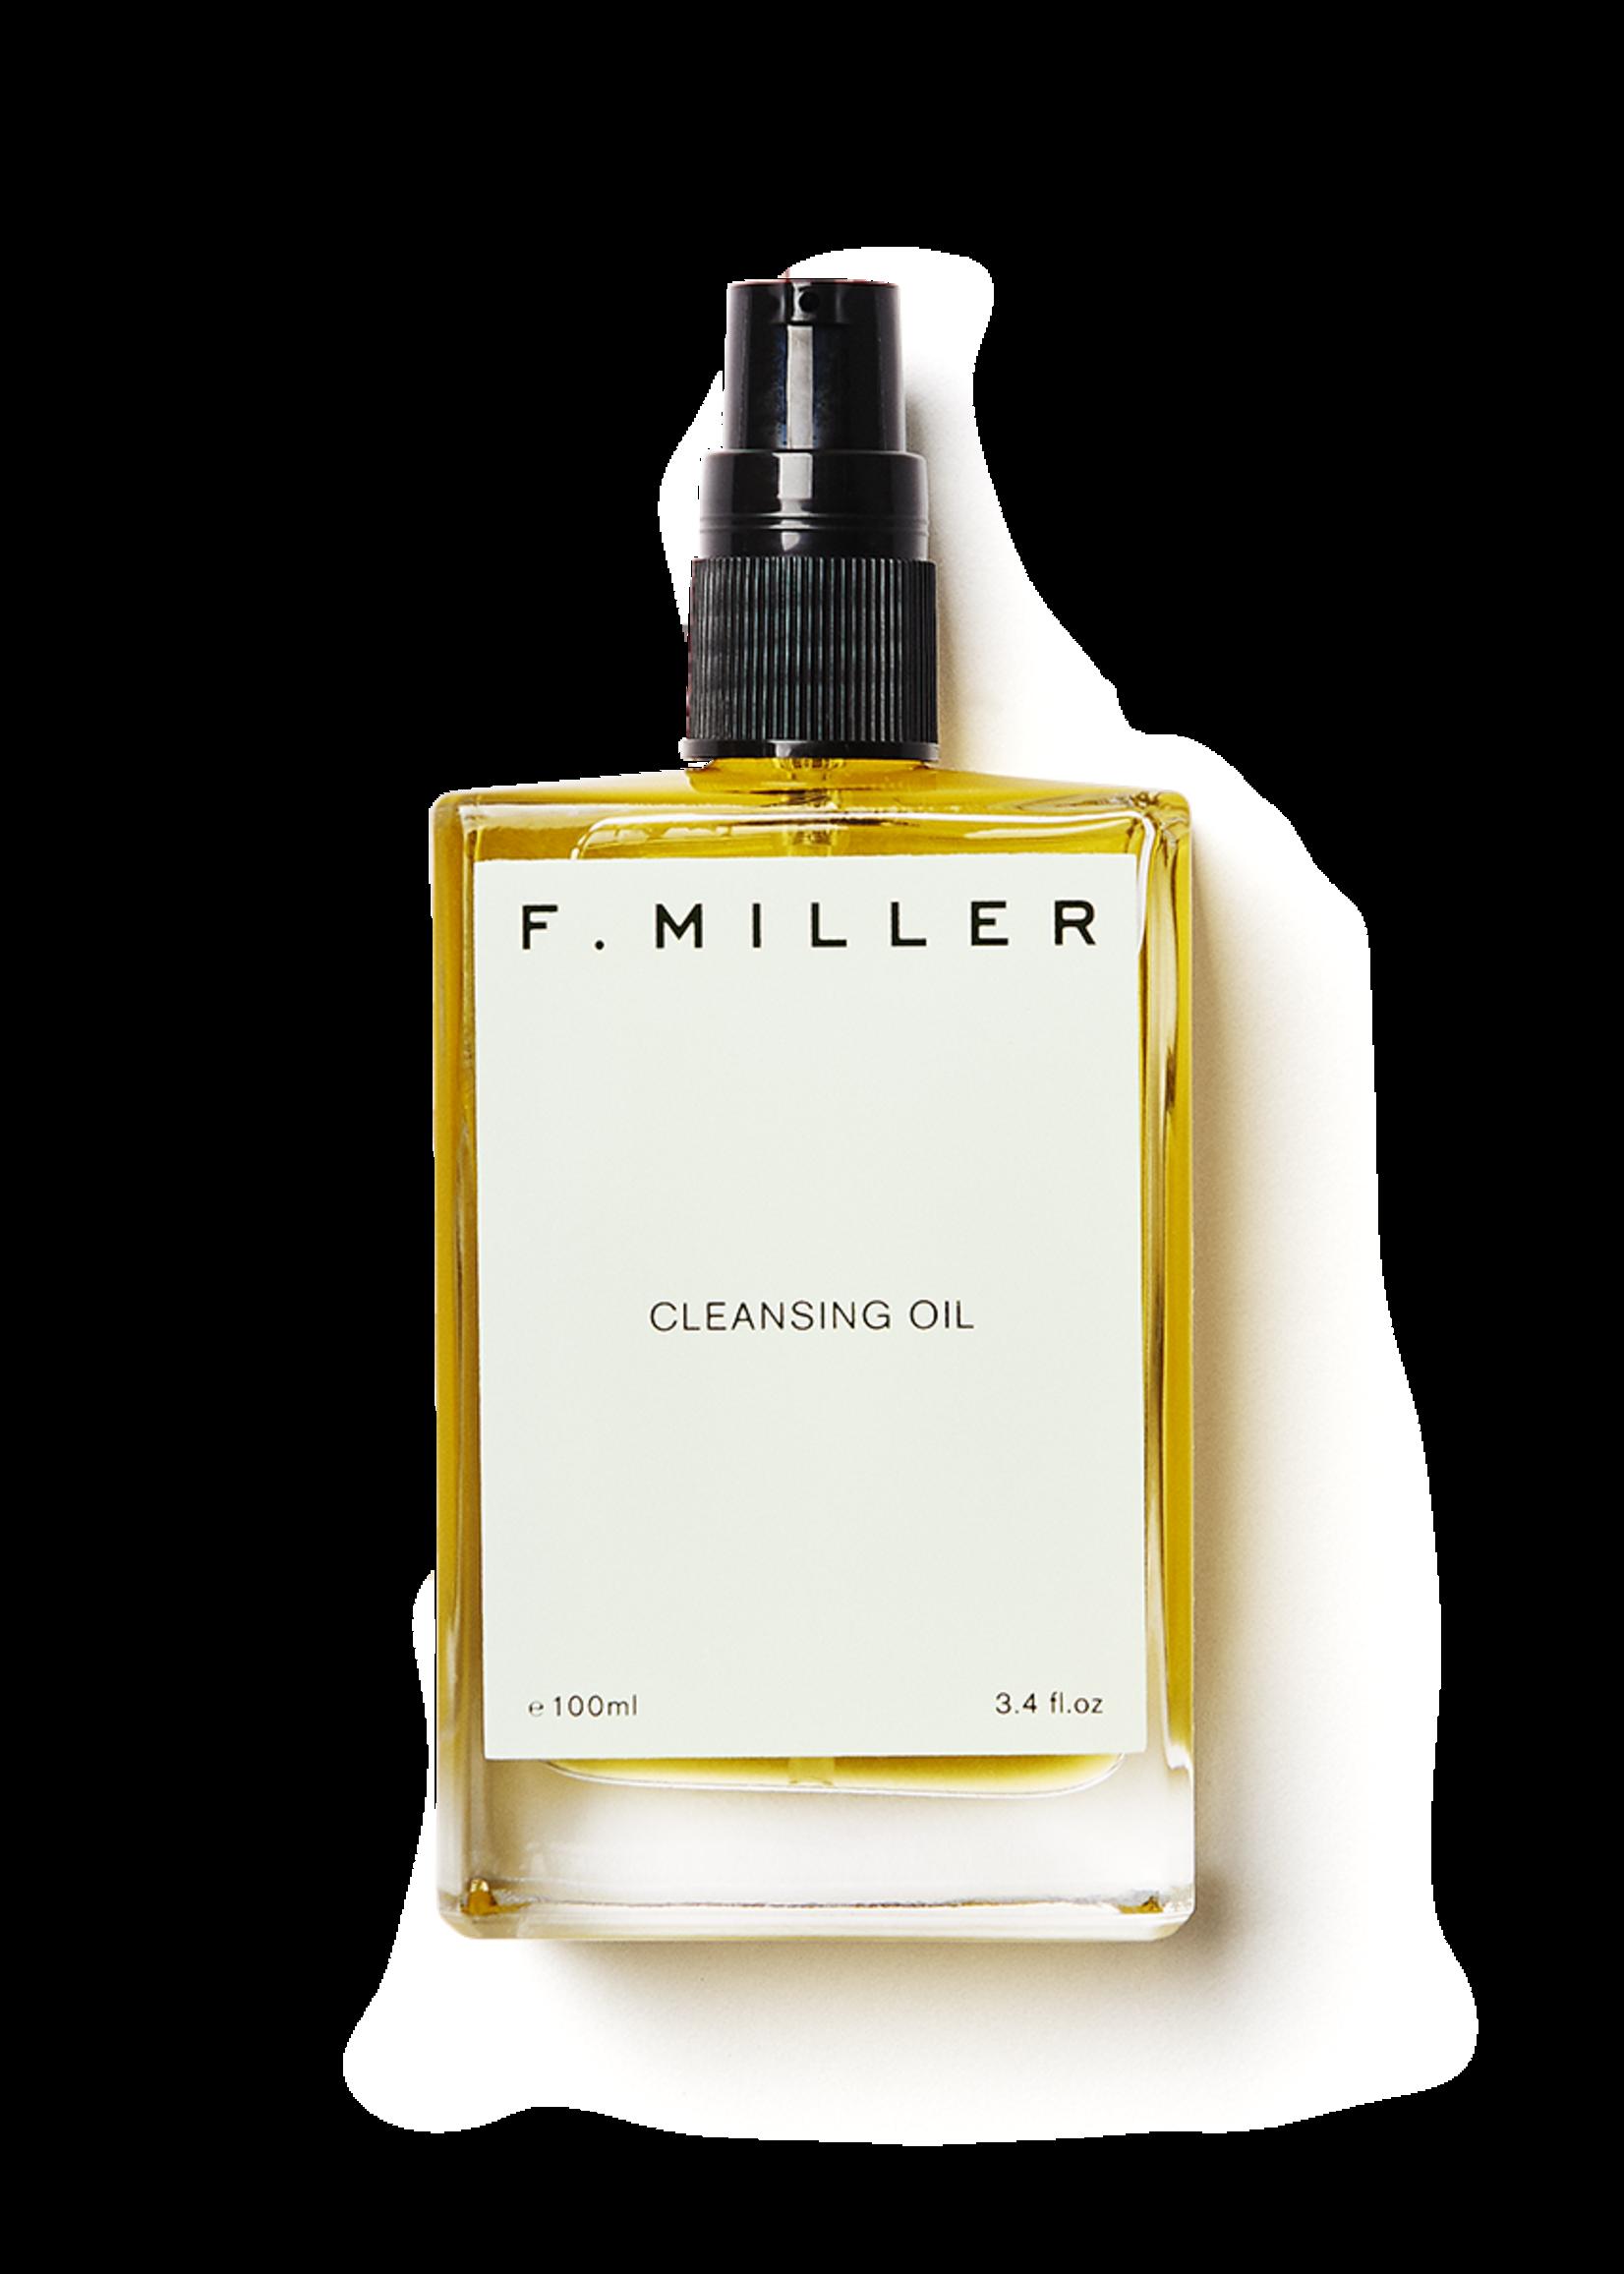 F. MILLER Cleansing Oil